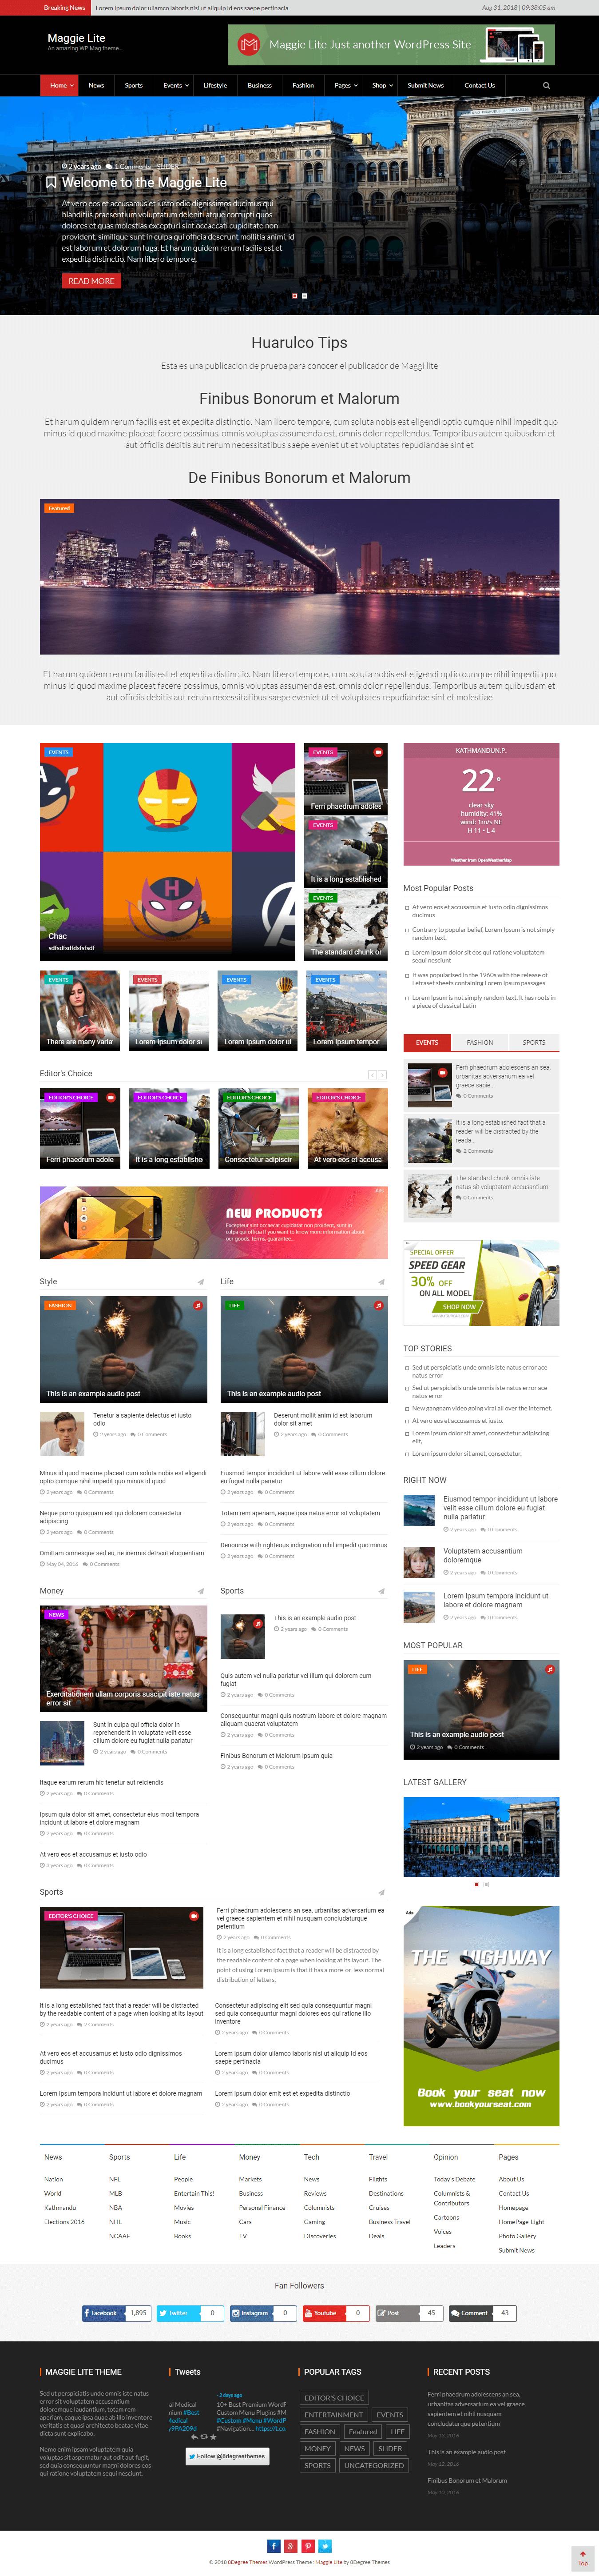 maggie lite best free adsense wordpress themes - 12+ Best Free Adsense WordPress Themes 2019 (Google Adsense Optimized)